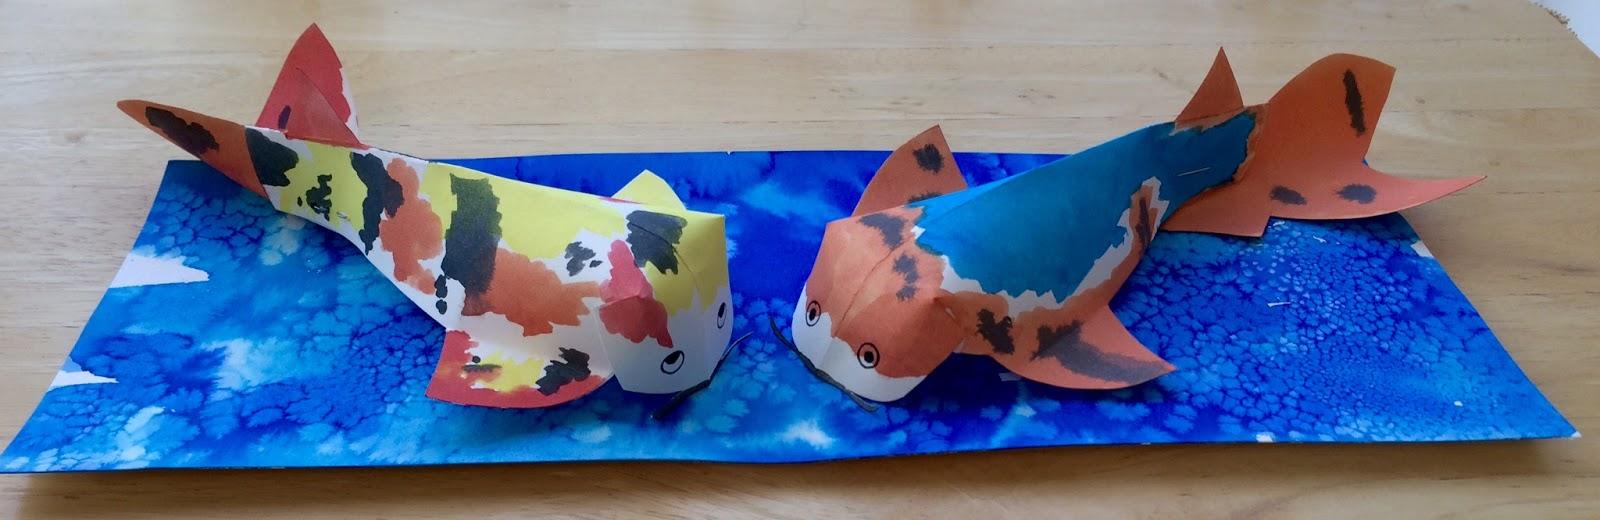 kathy s angelnik designs art project ideas 3d japanese koi